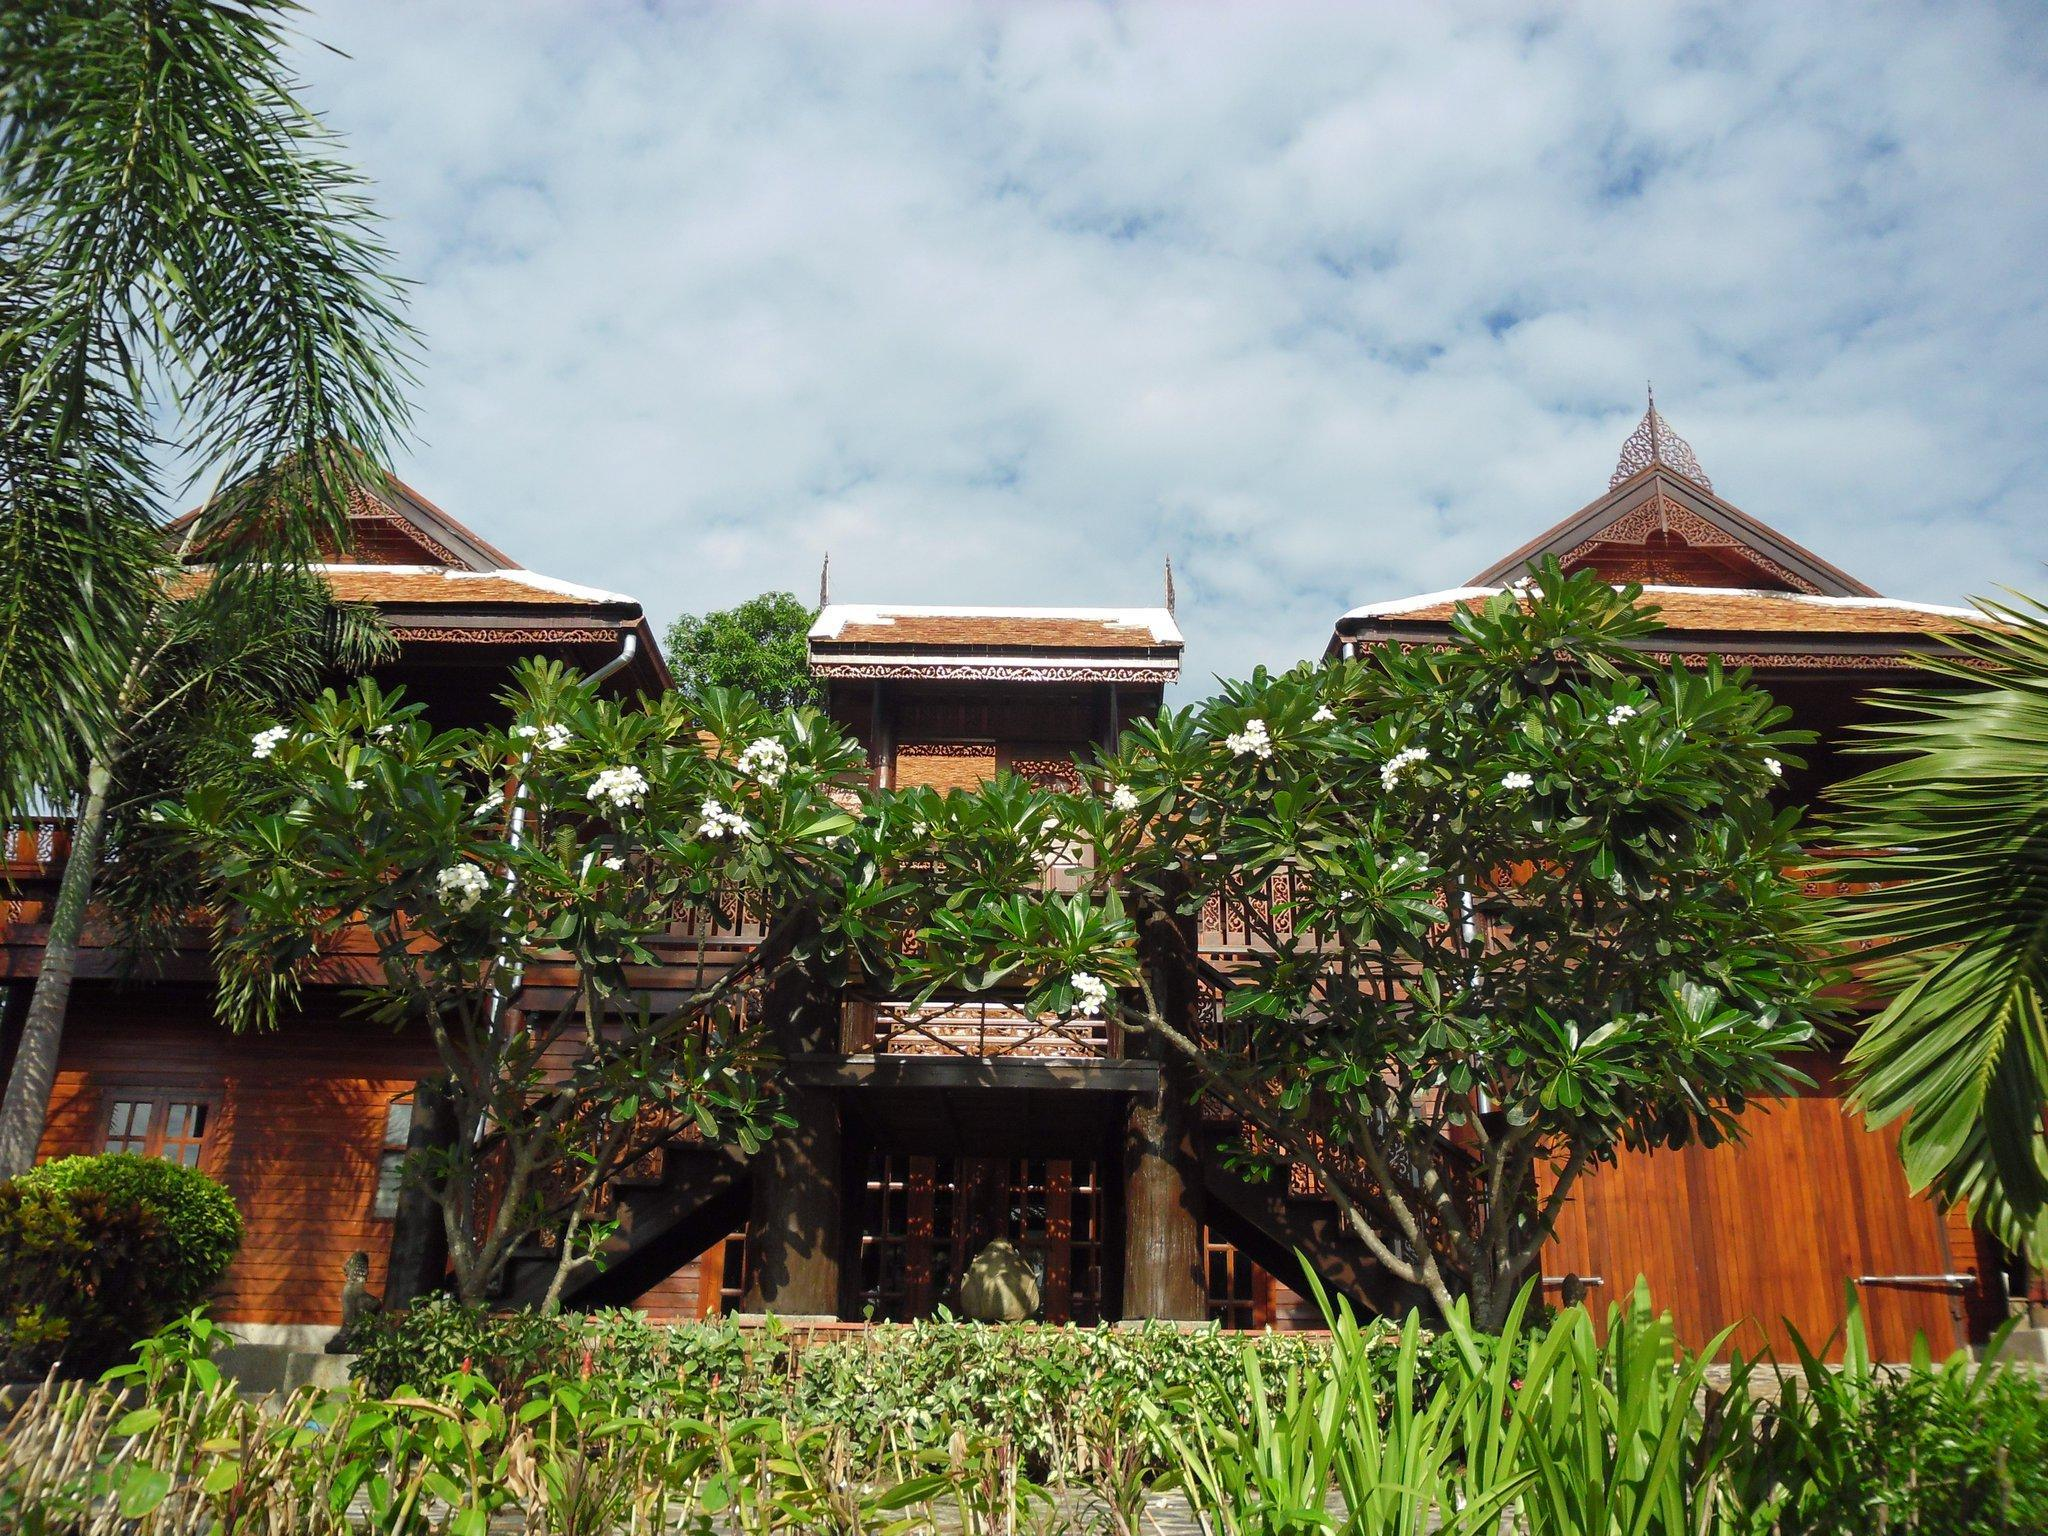 Baan Mali บ้านมะลิ